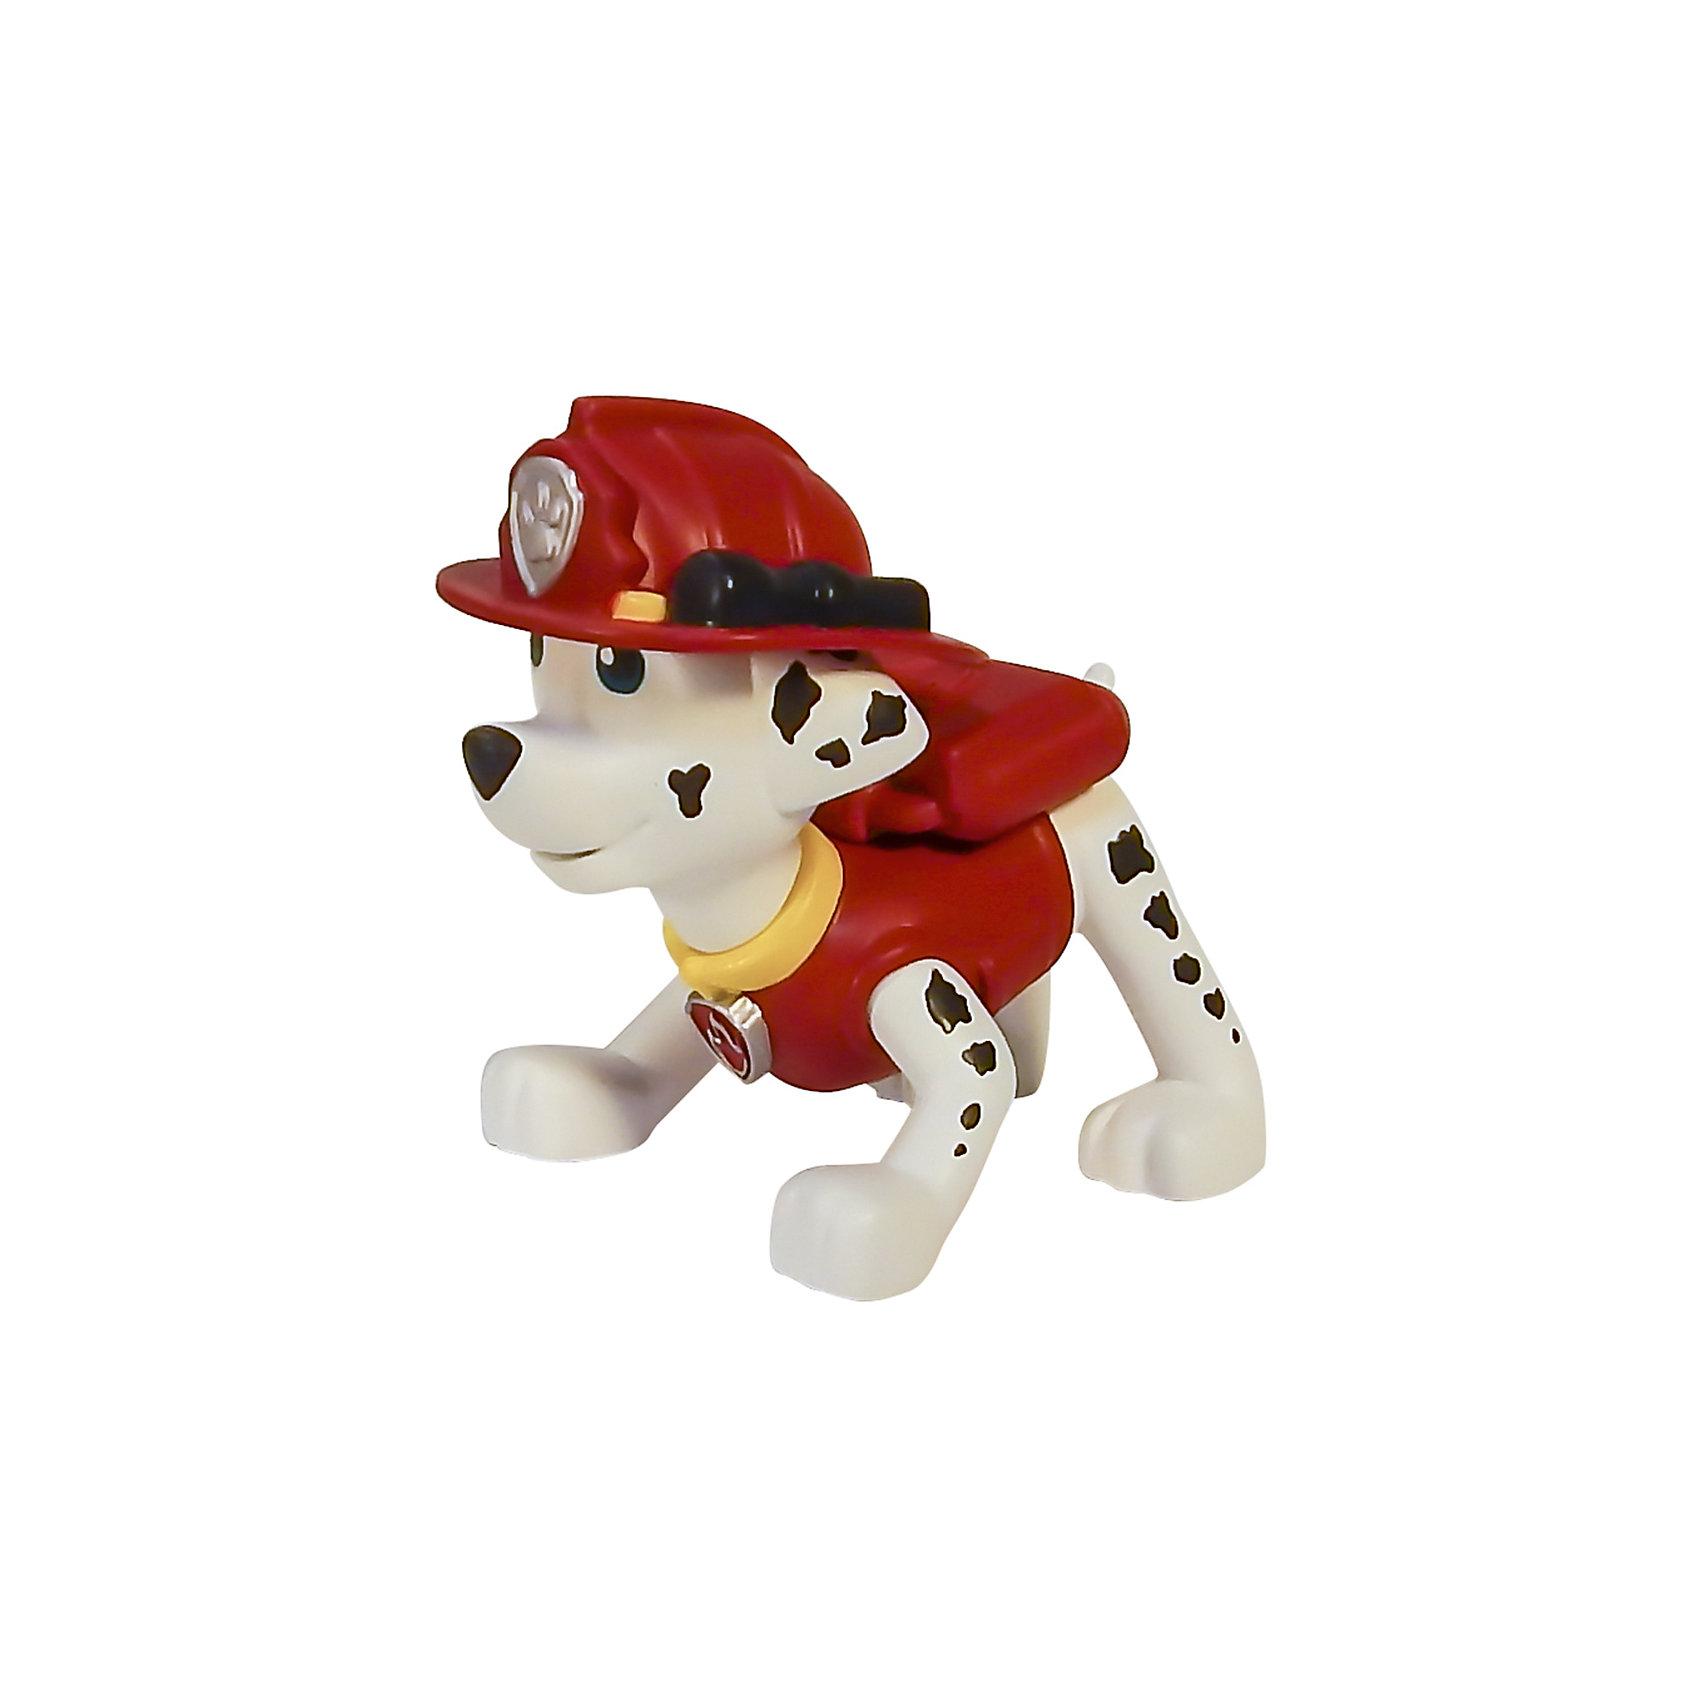 Spin Master Маленькая фигурка щенка Маршал, Щенячий патруль, Spin Master spin master фигурка спасатель рокки со съемным рюкзаком щенячий патруль